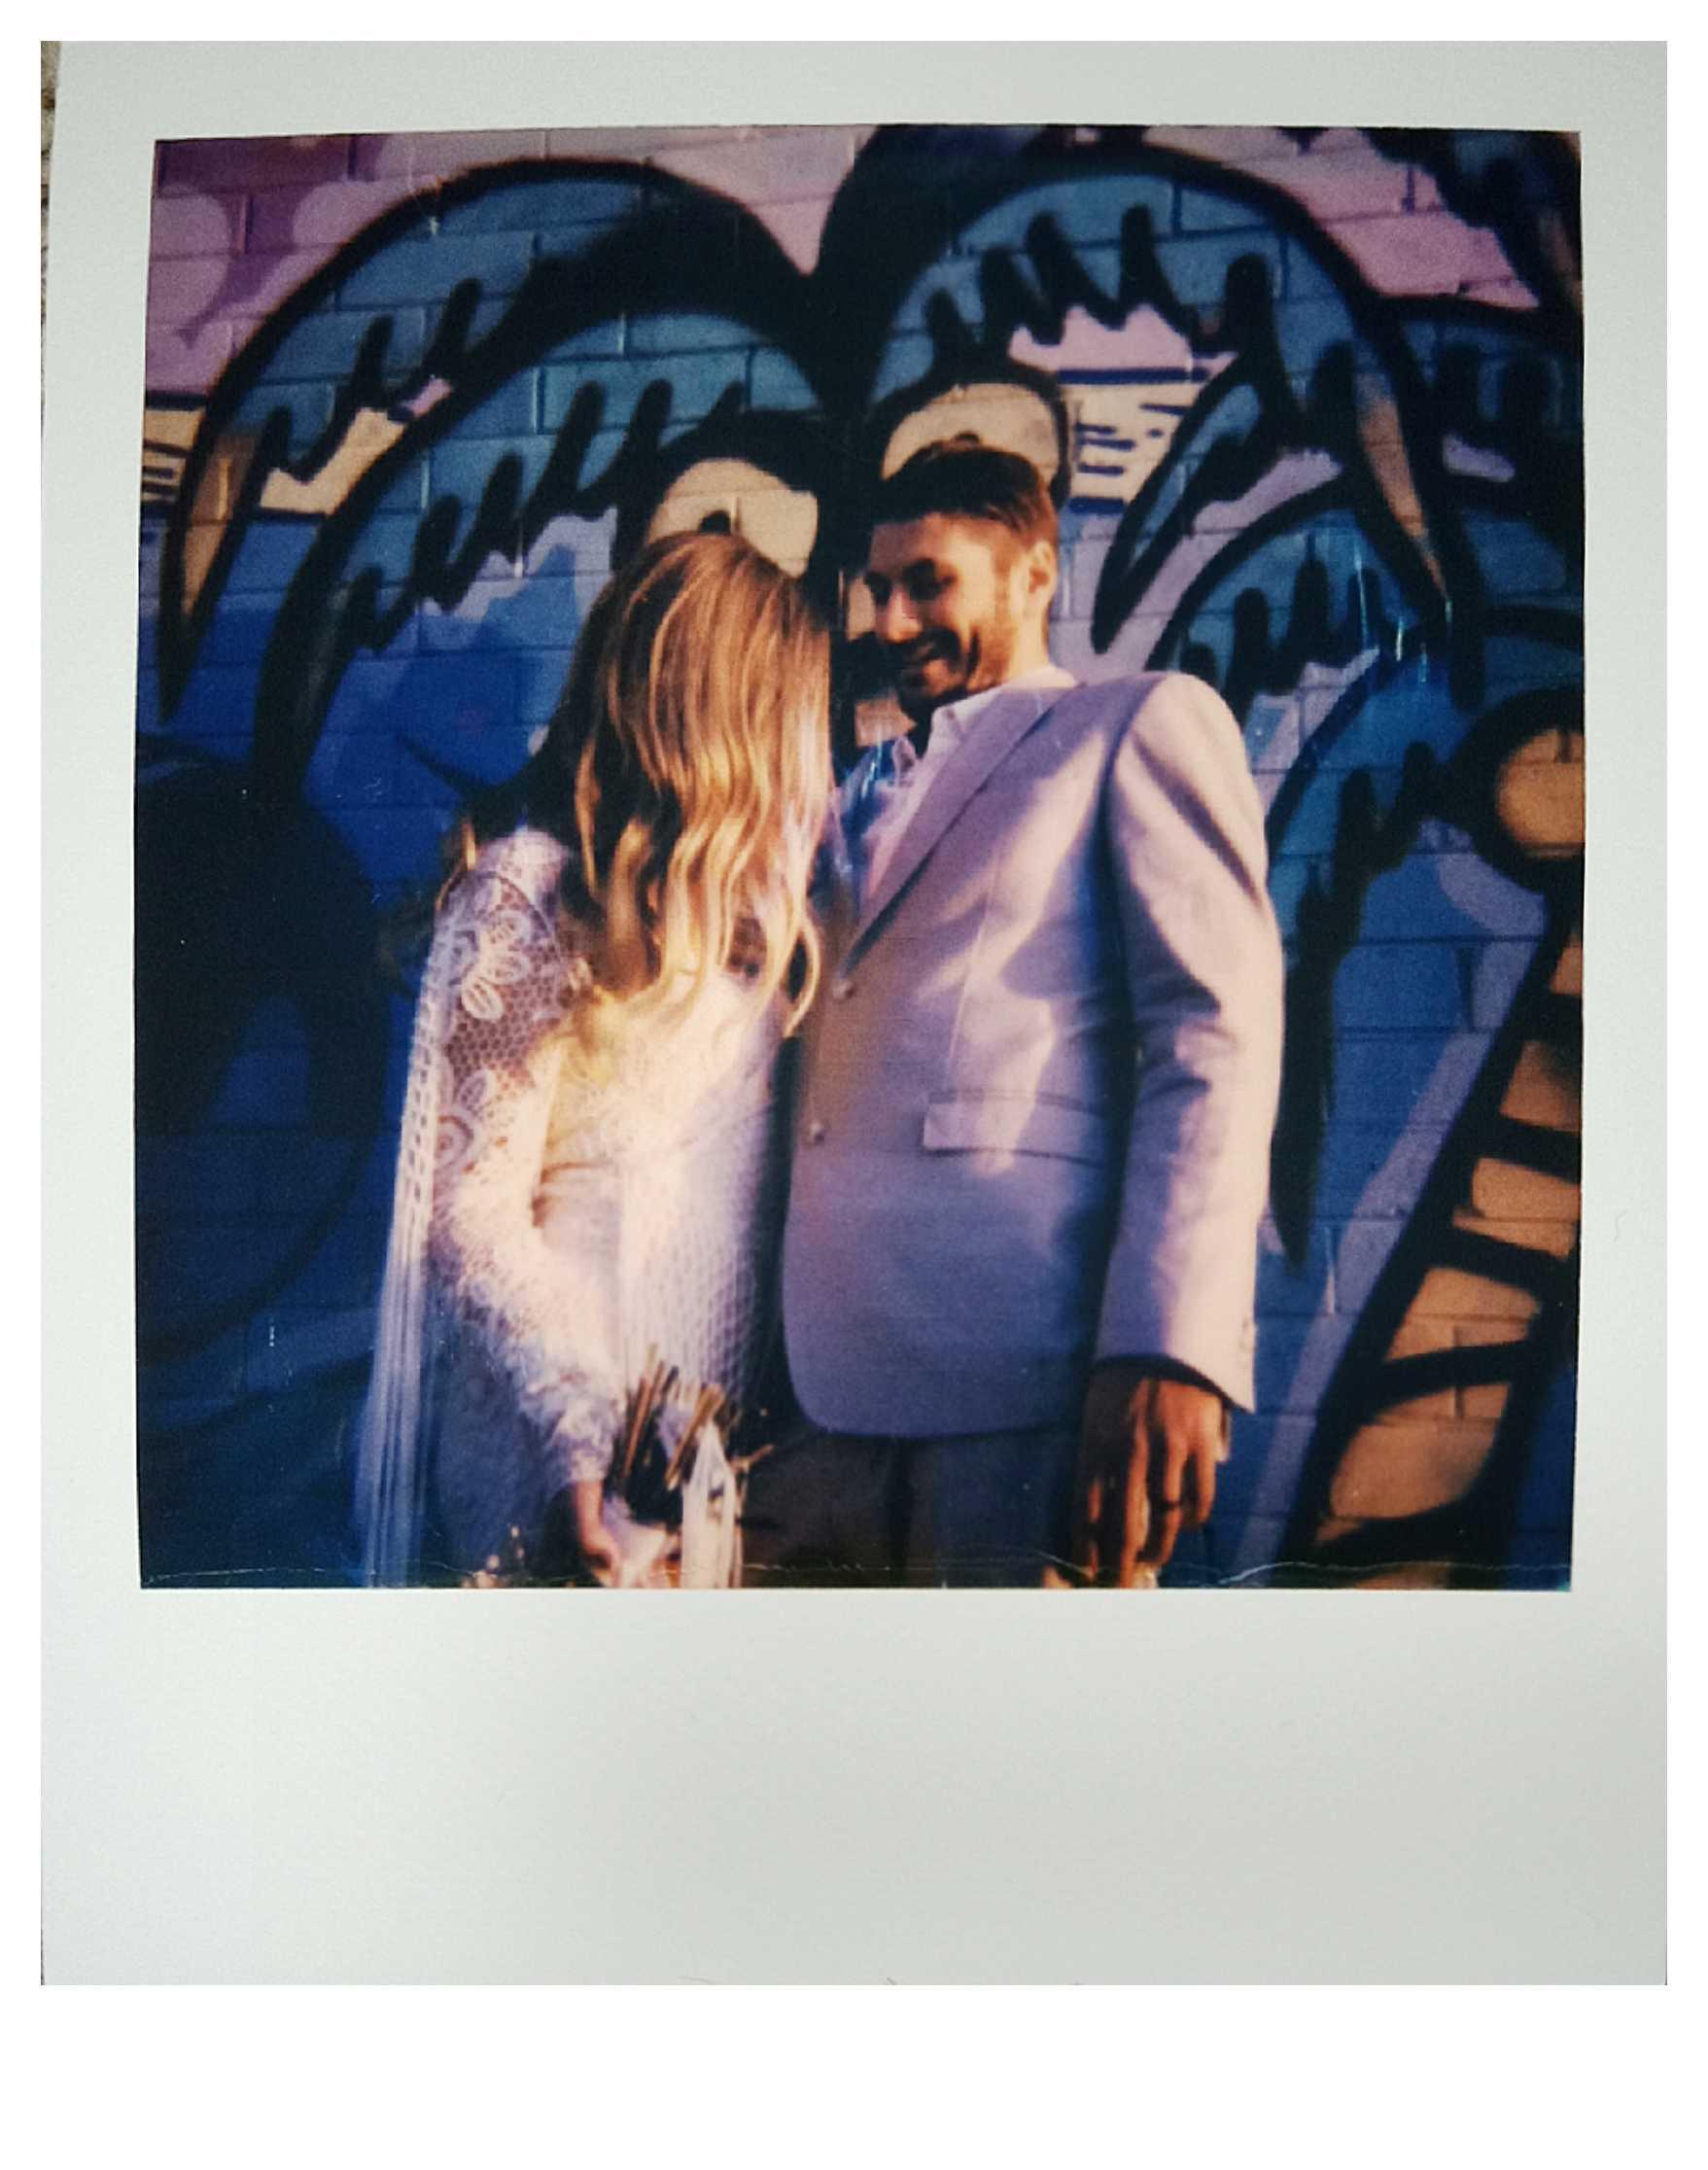 S&A Elopement - Kings & Thieves - Shred 'Til Dead - Central Coast Beach Forest Wedding - 362.jpg